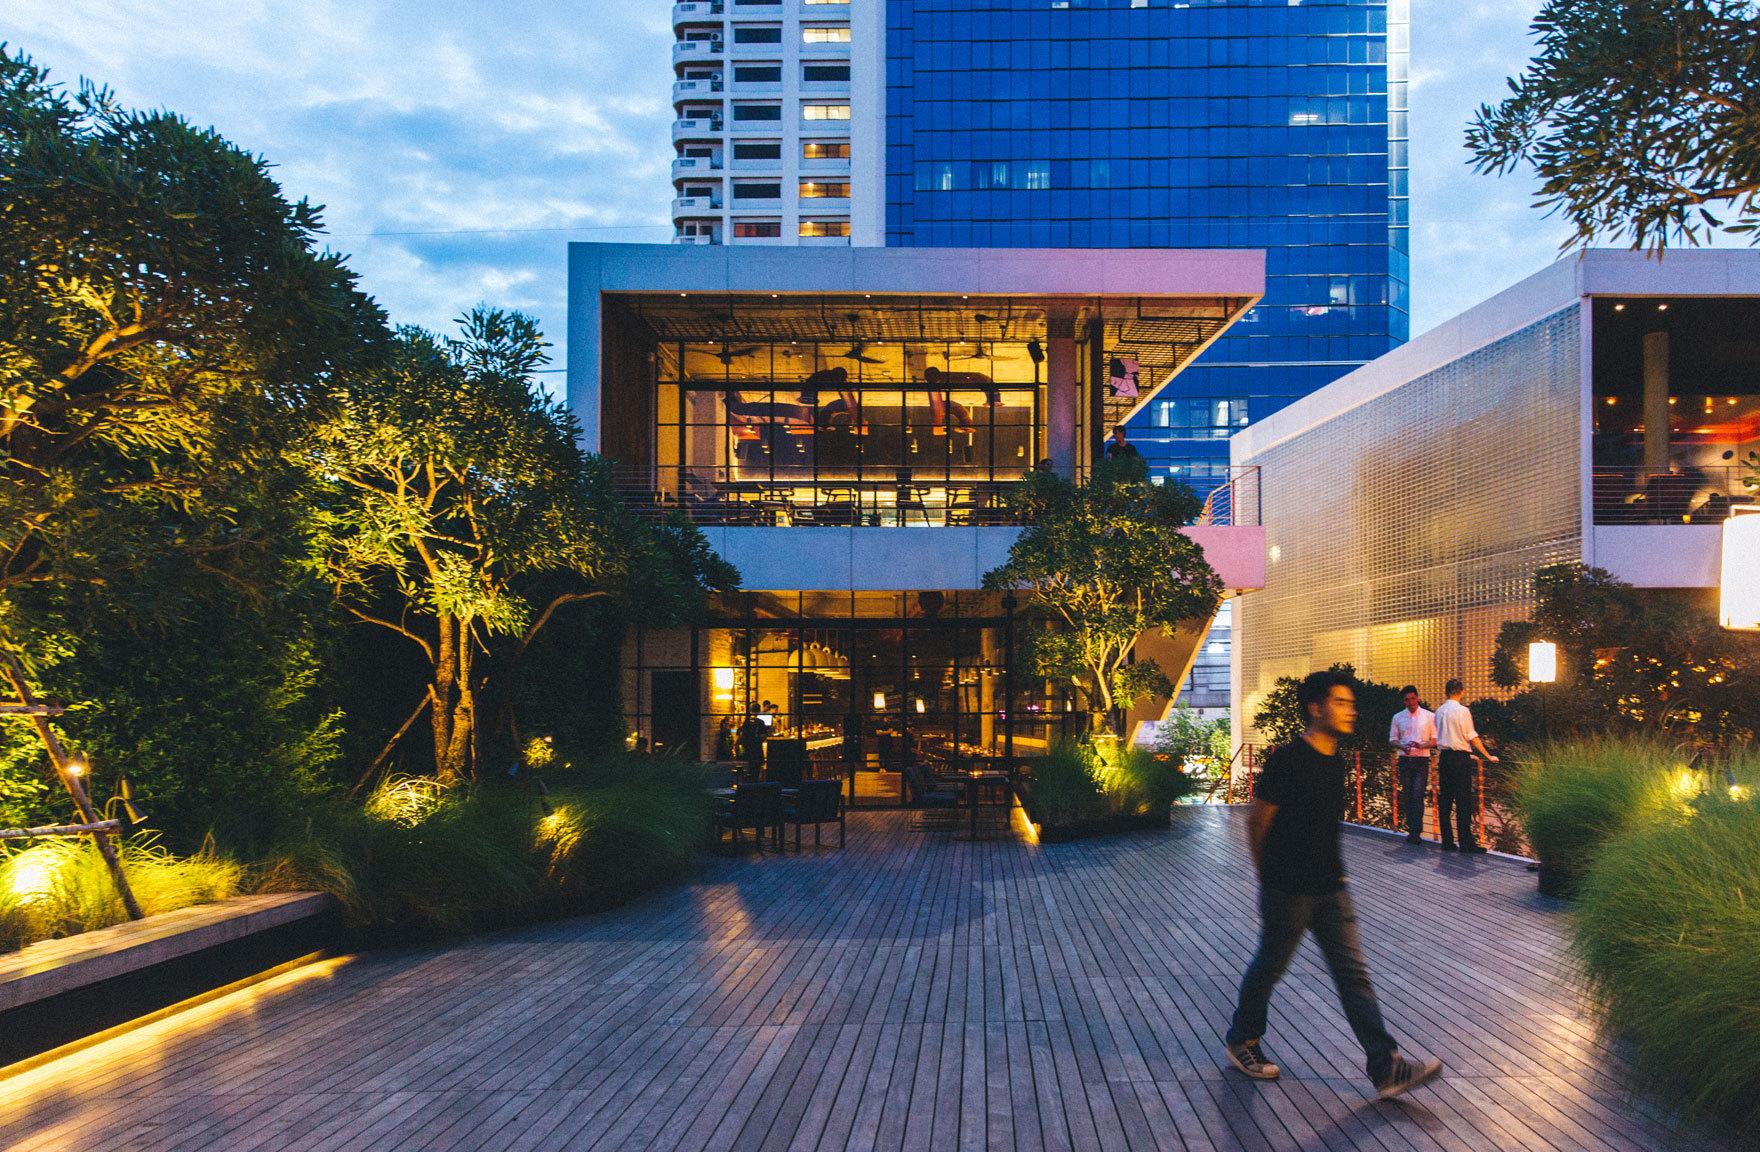 Restaurants and bars at 72 Courtyard